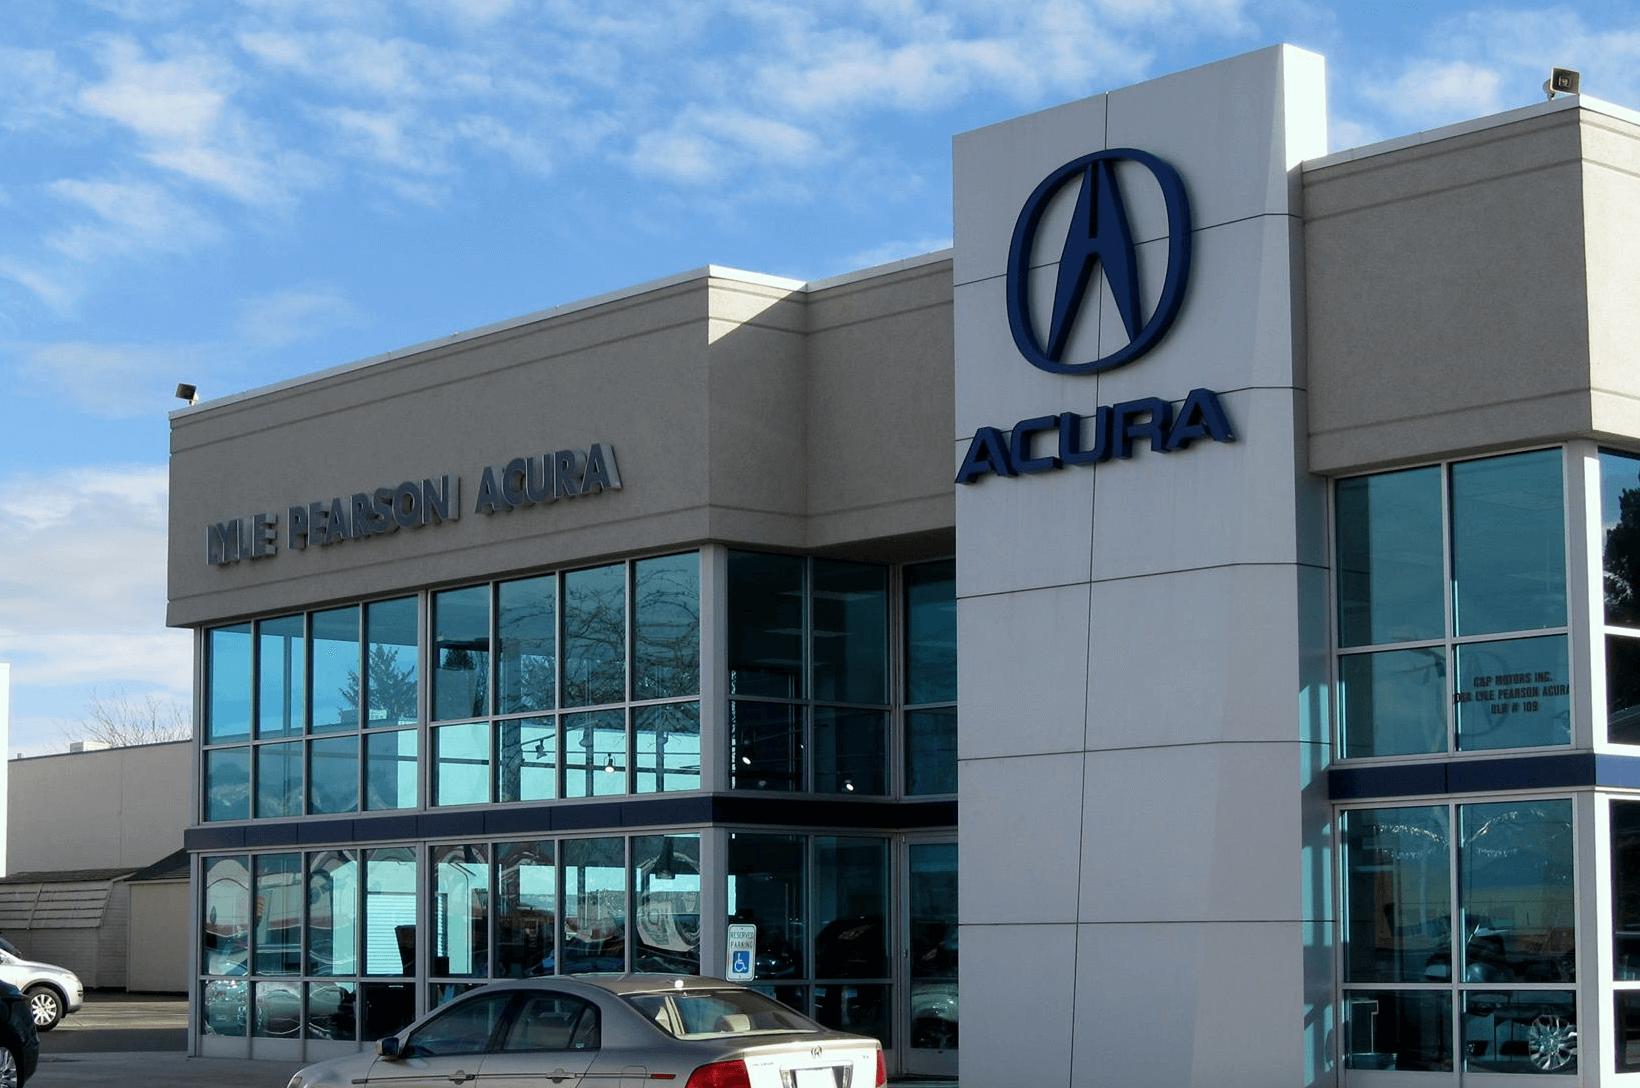 Lyle Pearson Acura Exterior